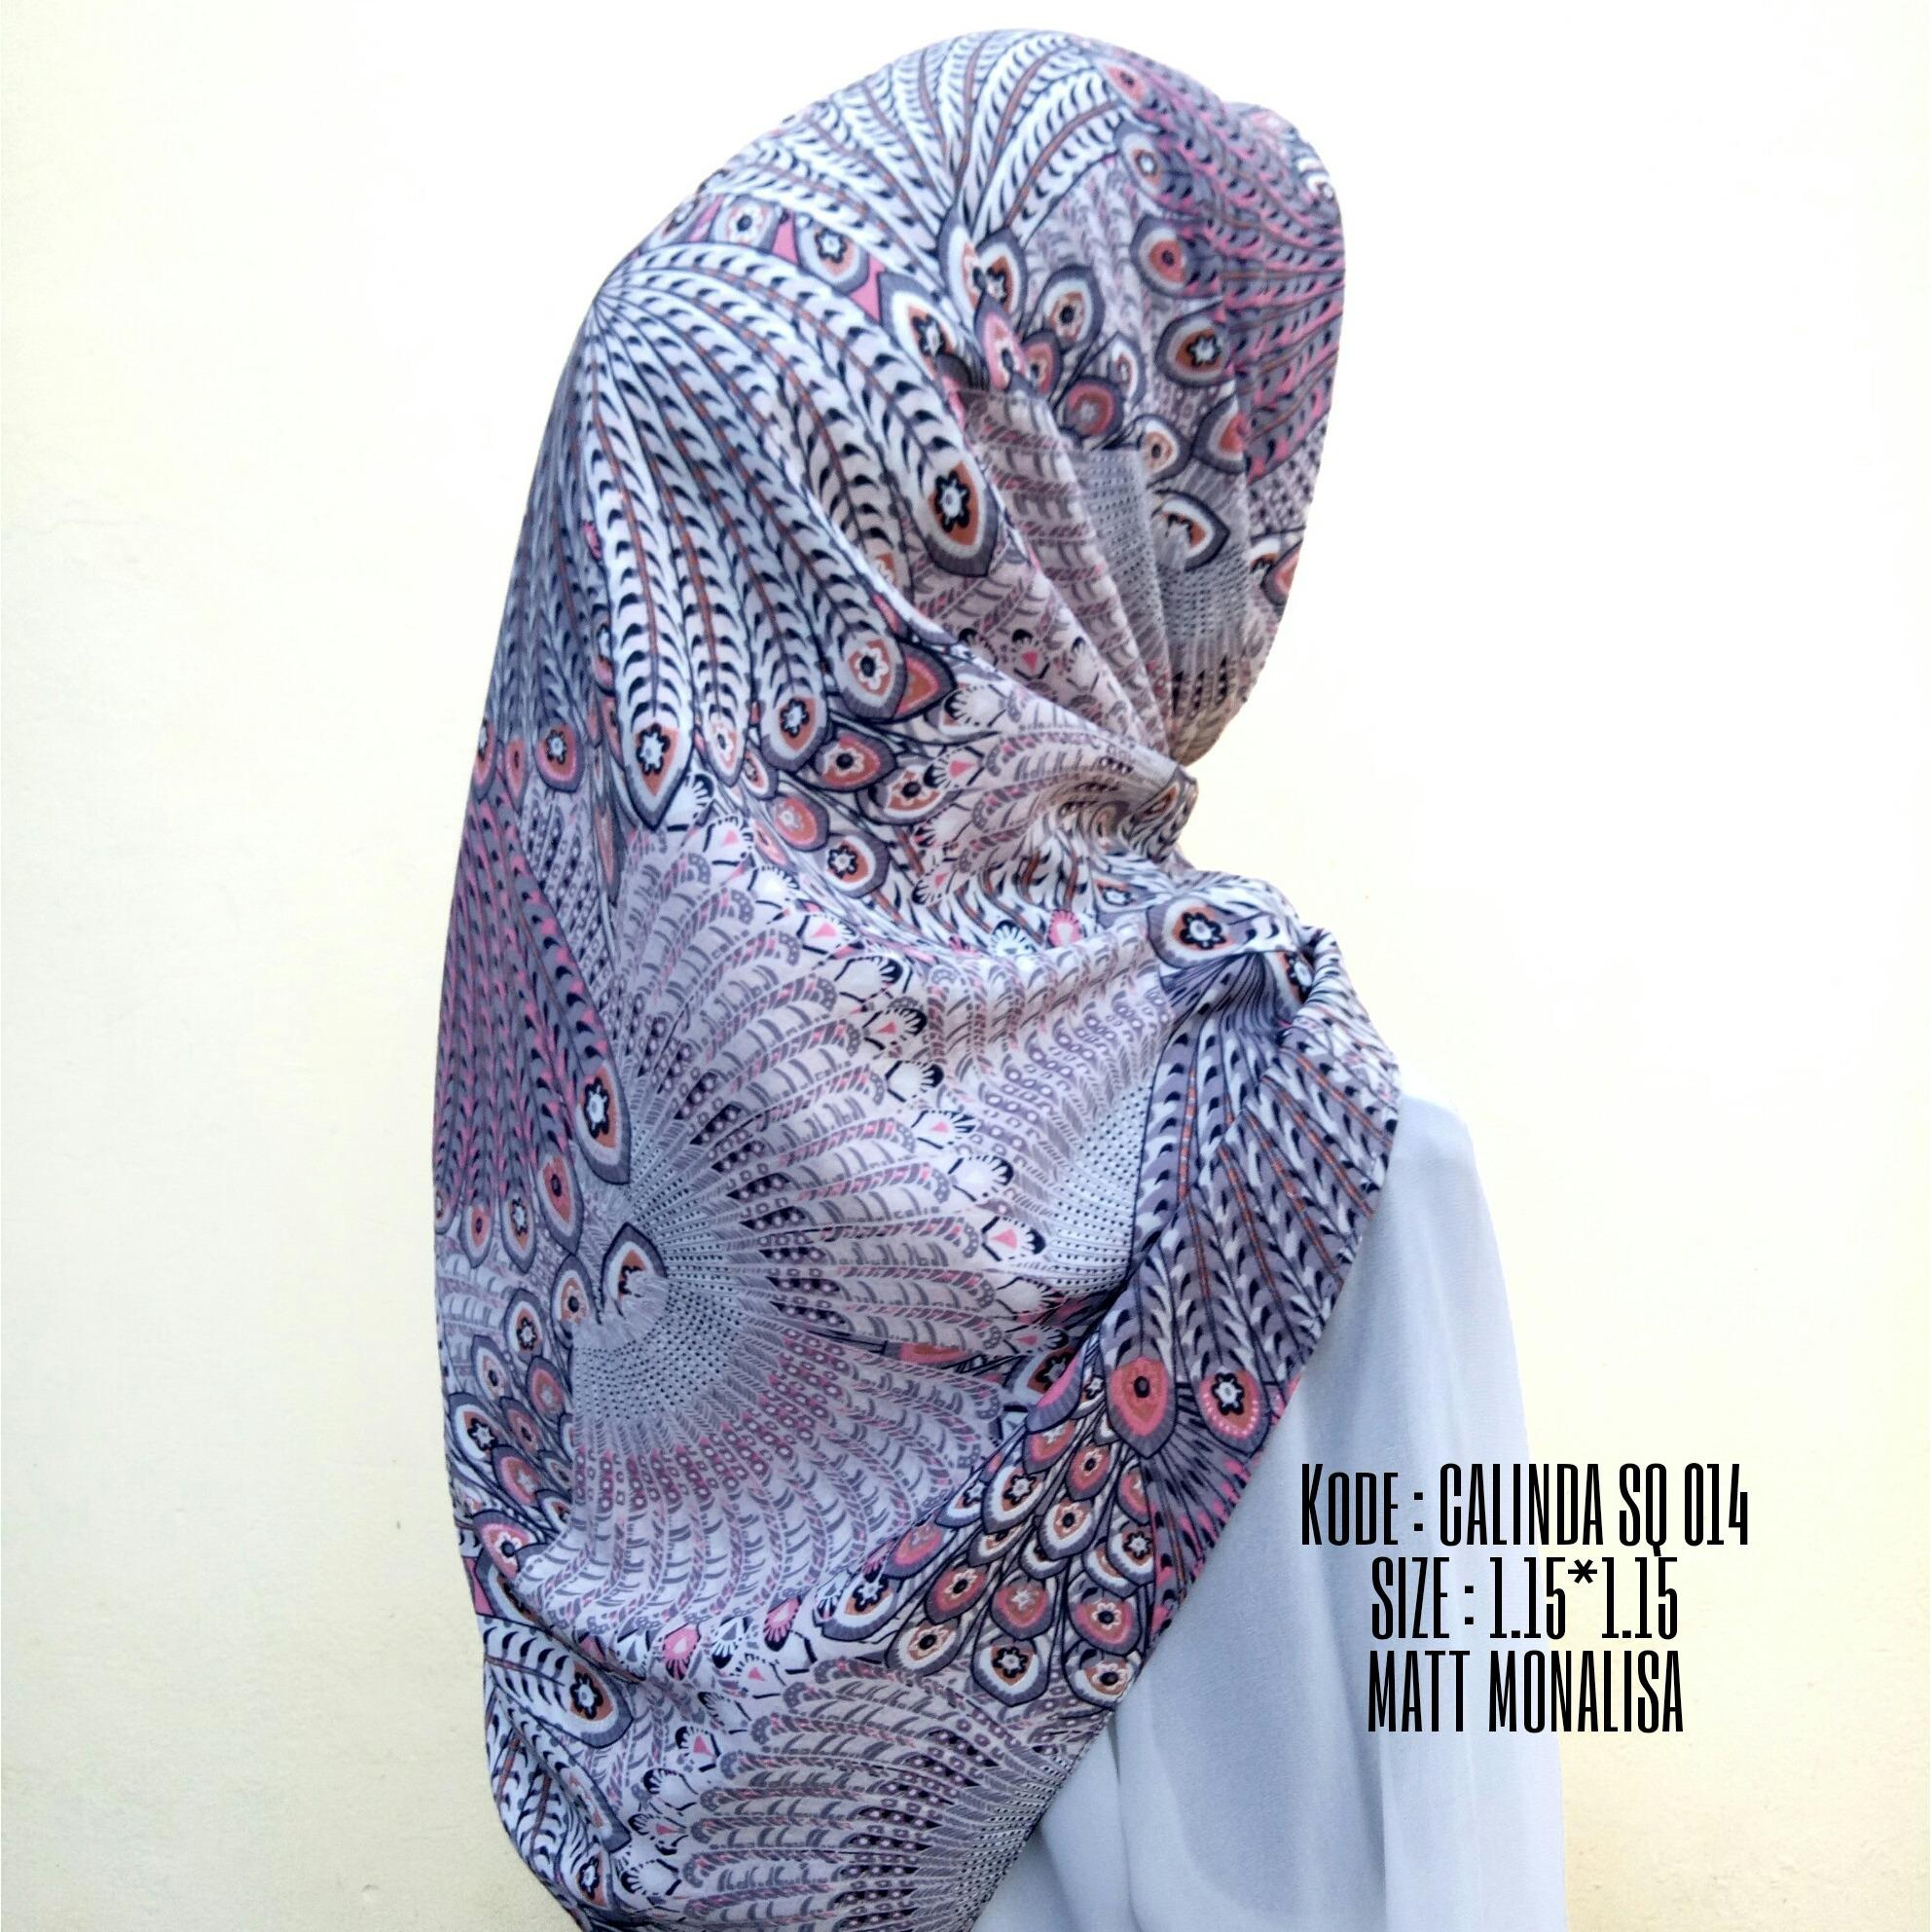 Calinda SQ Merak Jilbab Kerudung Motif Segi Empat Segi Tiga Murah by Nggemesin Hijab